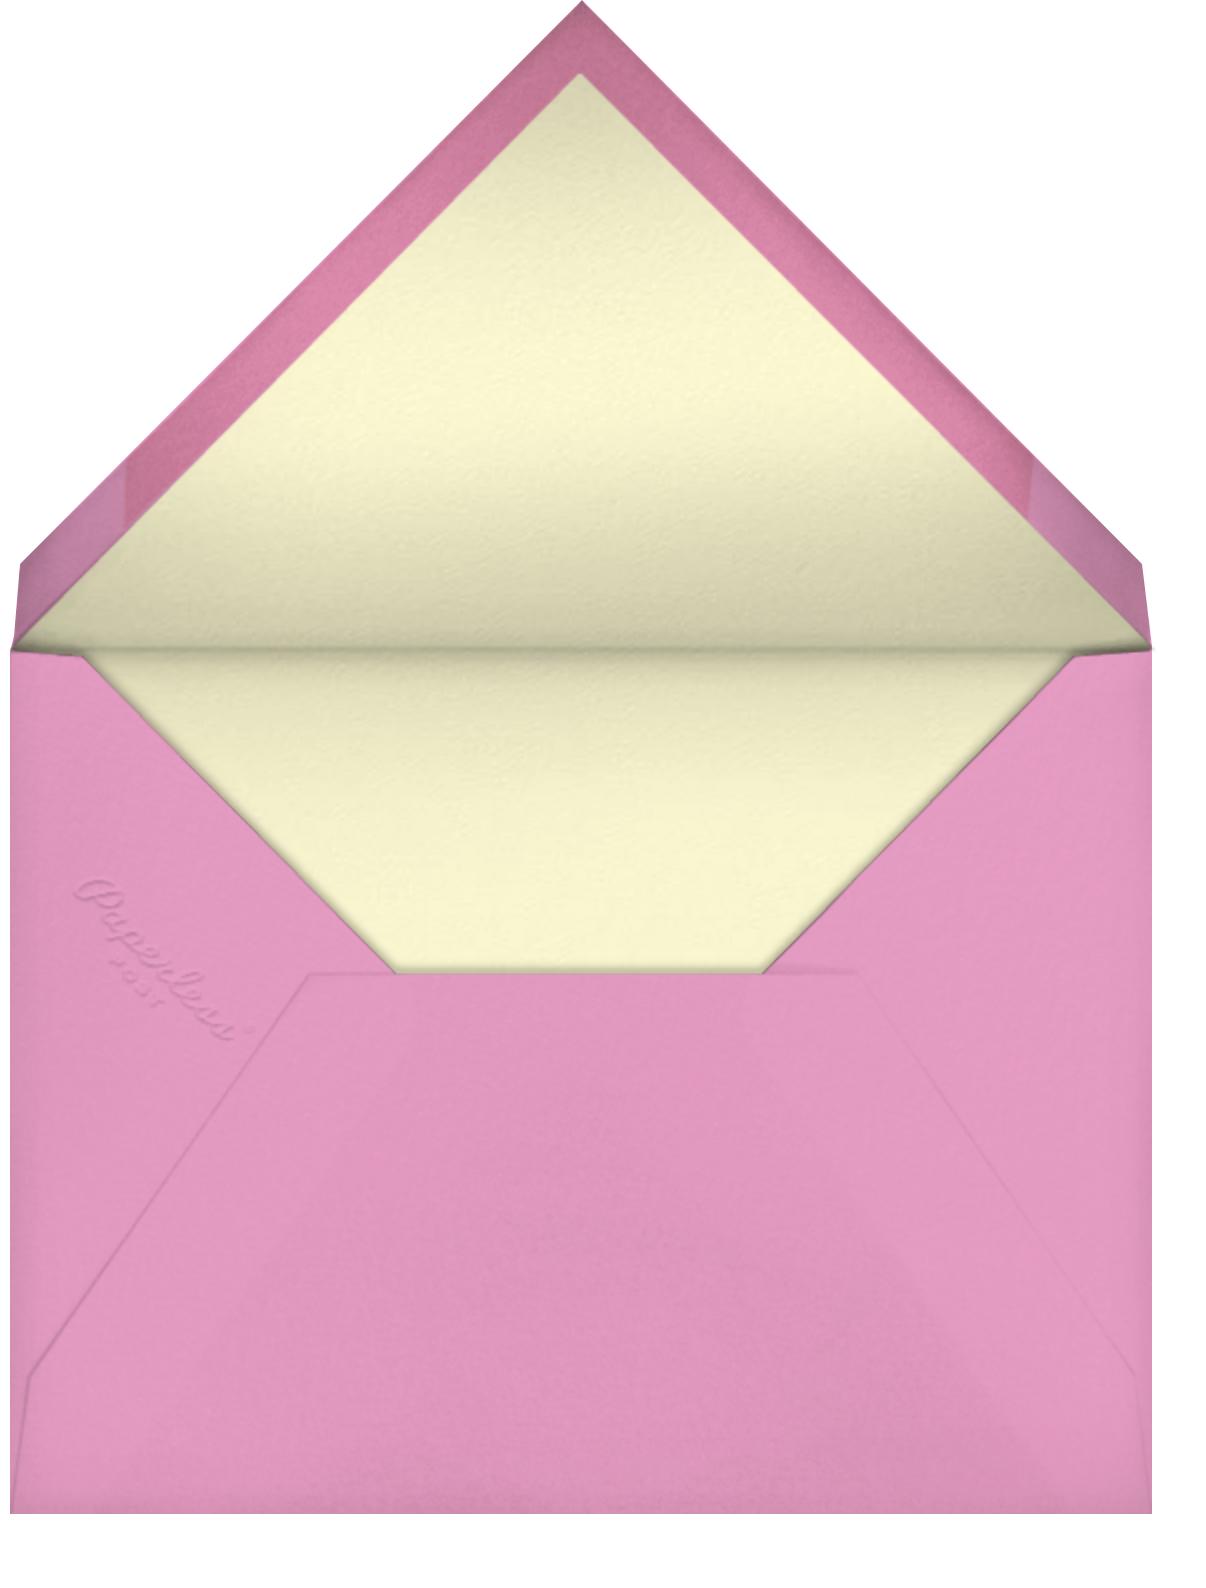 Painted Posies - Mauve - kate spade new york - Virtual parties - envelope back